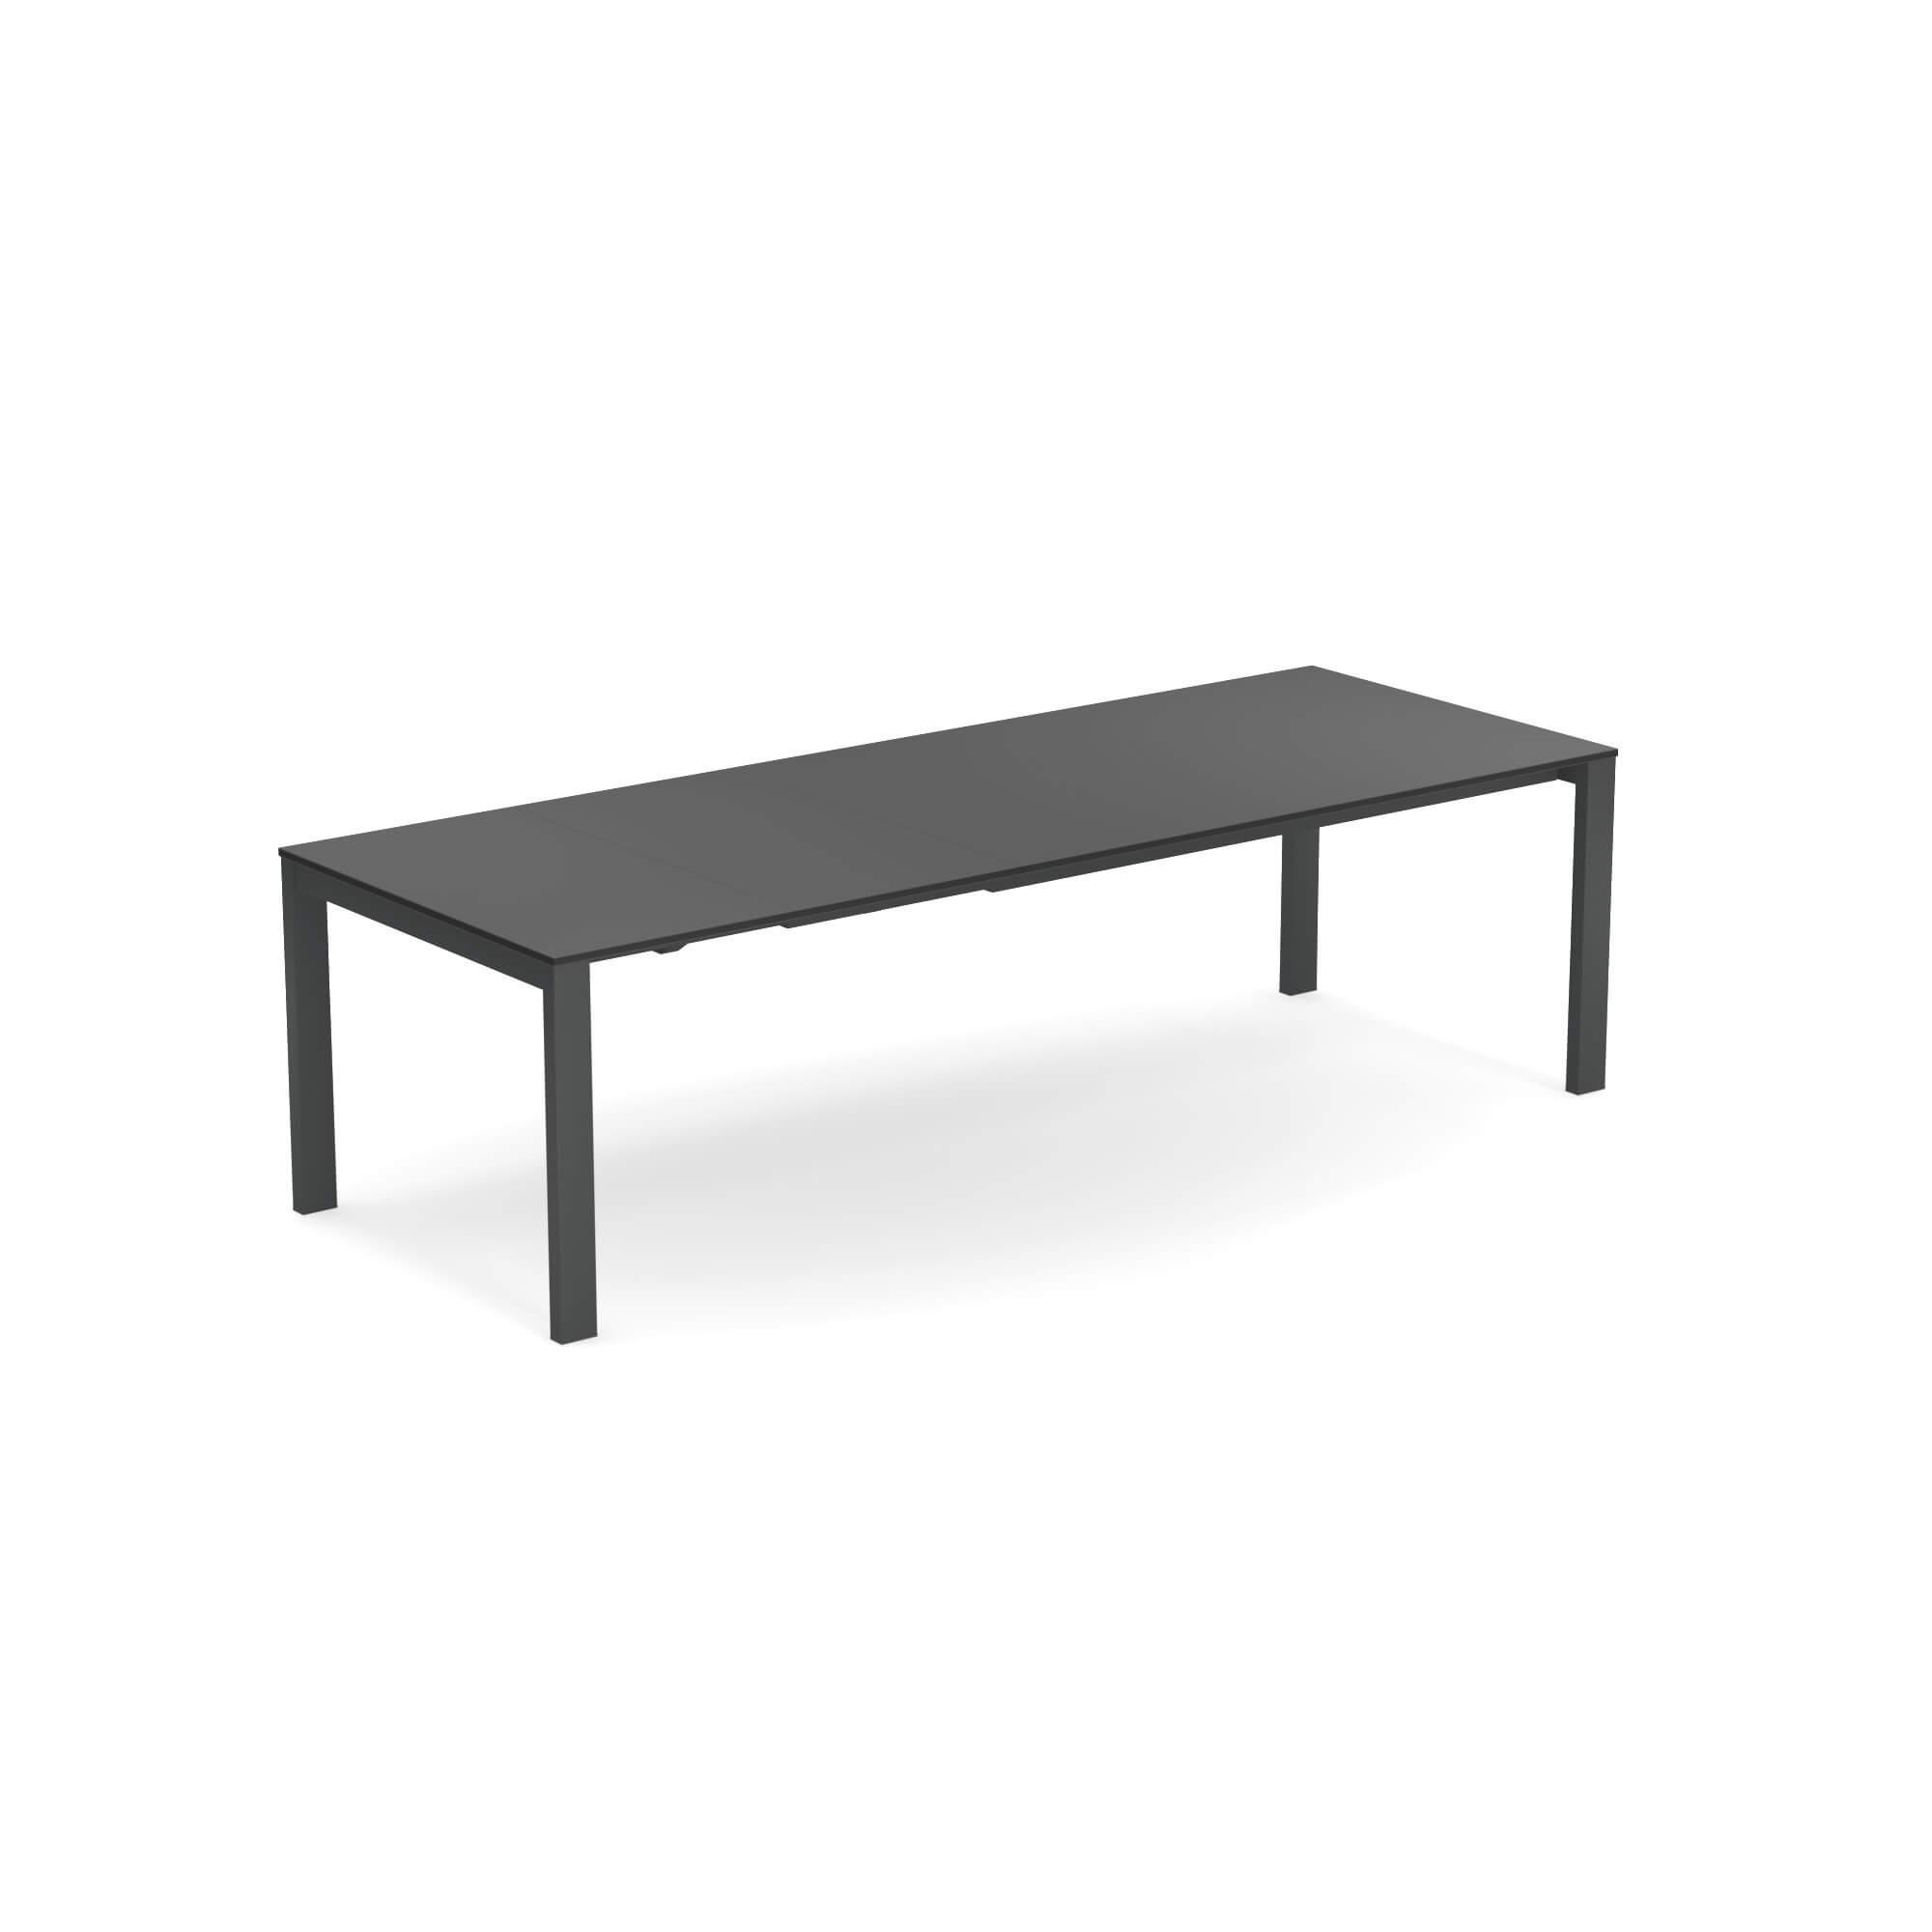 Emu Piano Tavolo Allungabile.Garden Extensible Table With Hpl Top 160 54 54x100 Outside In